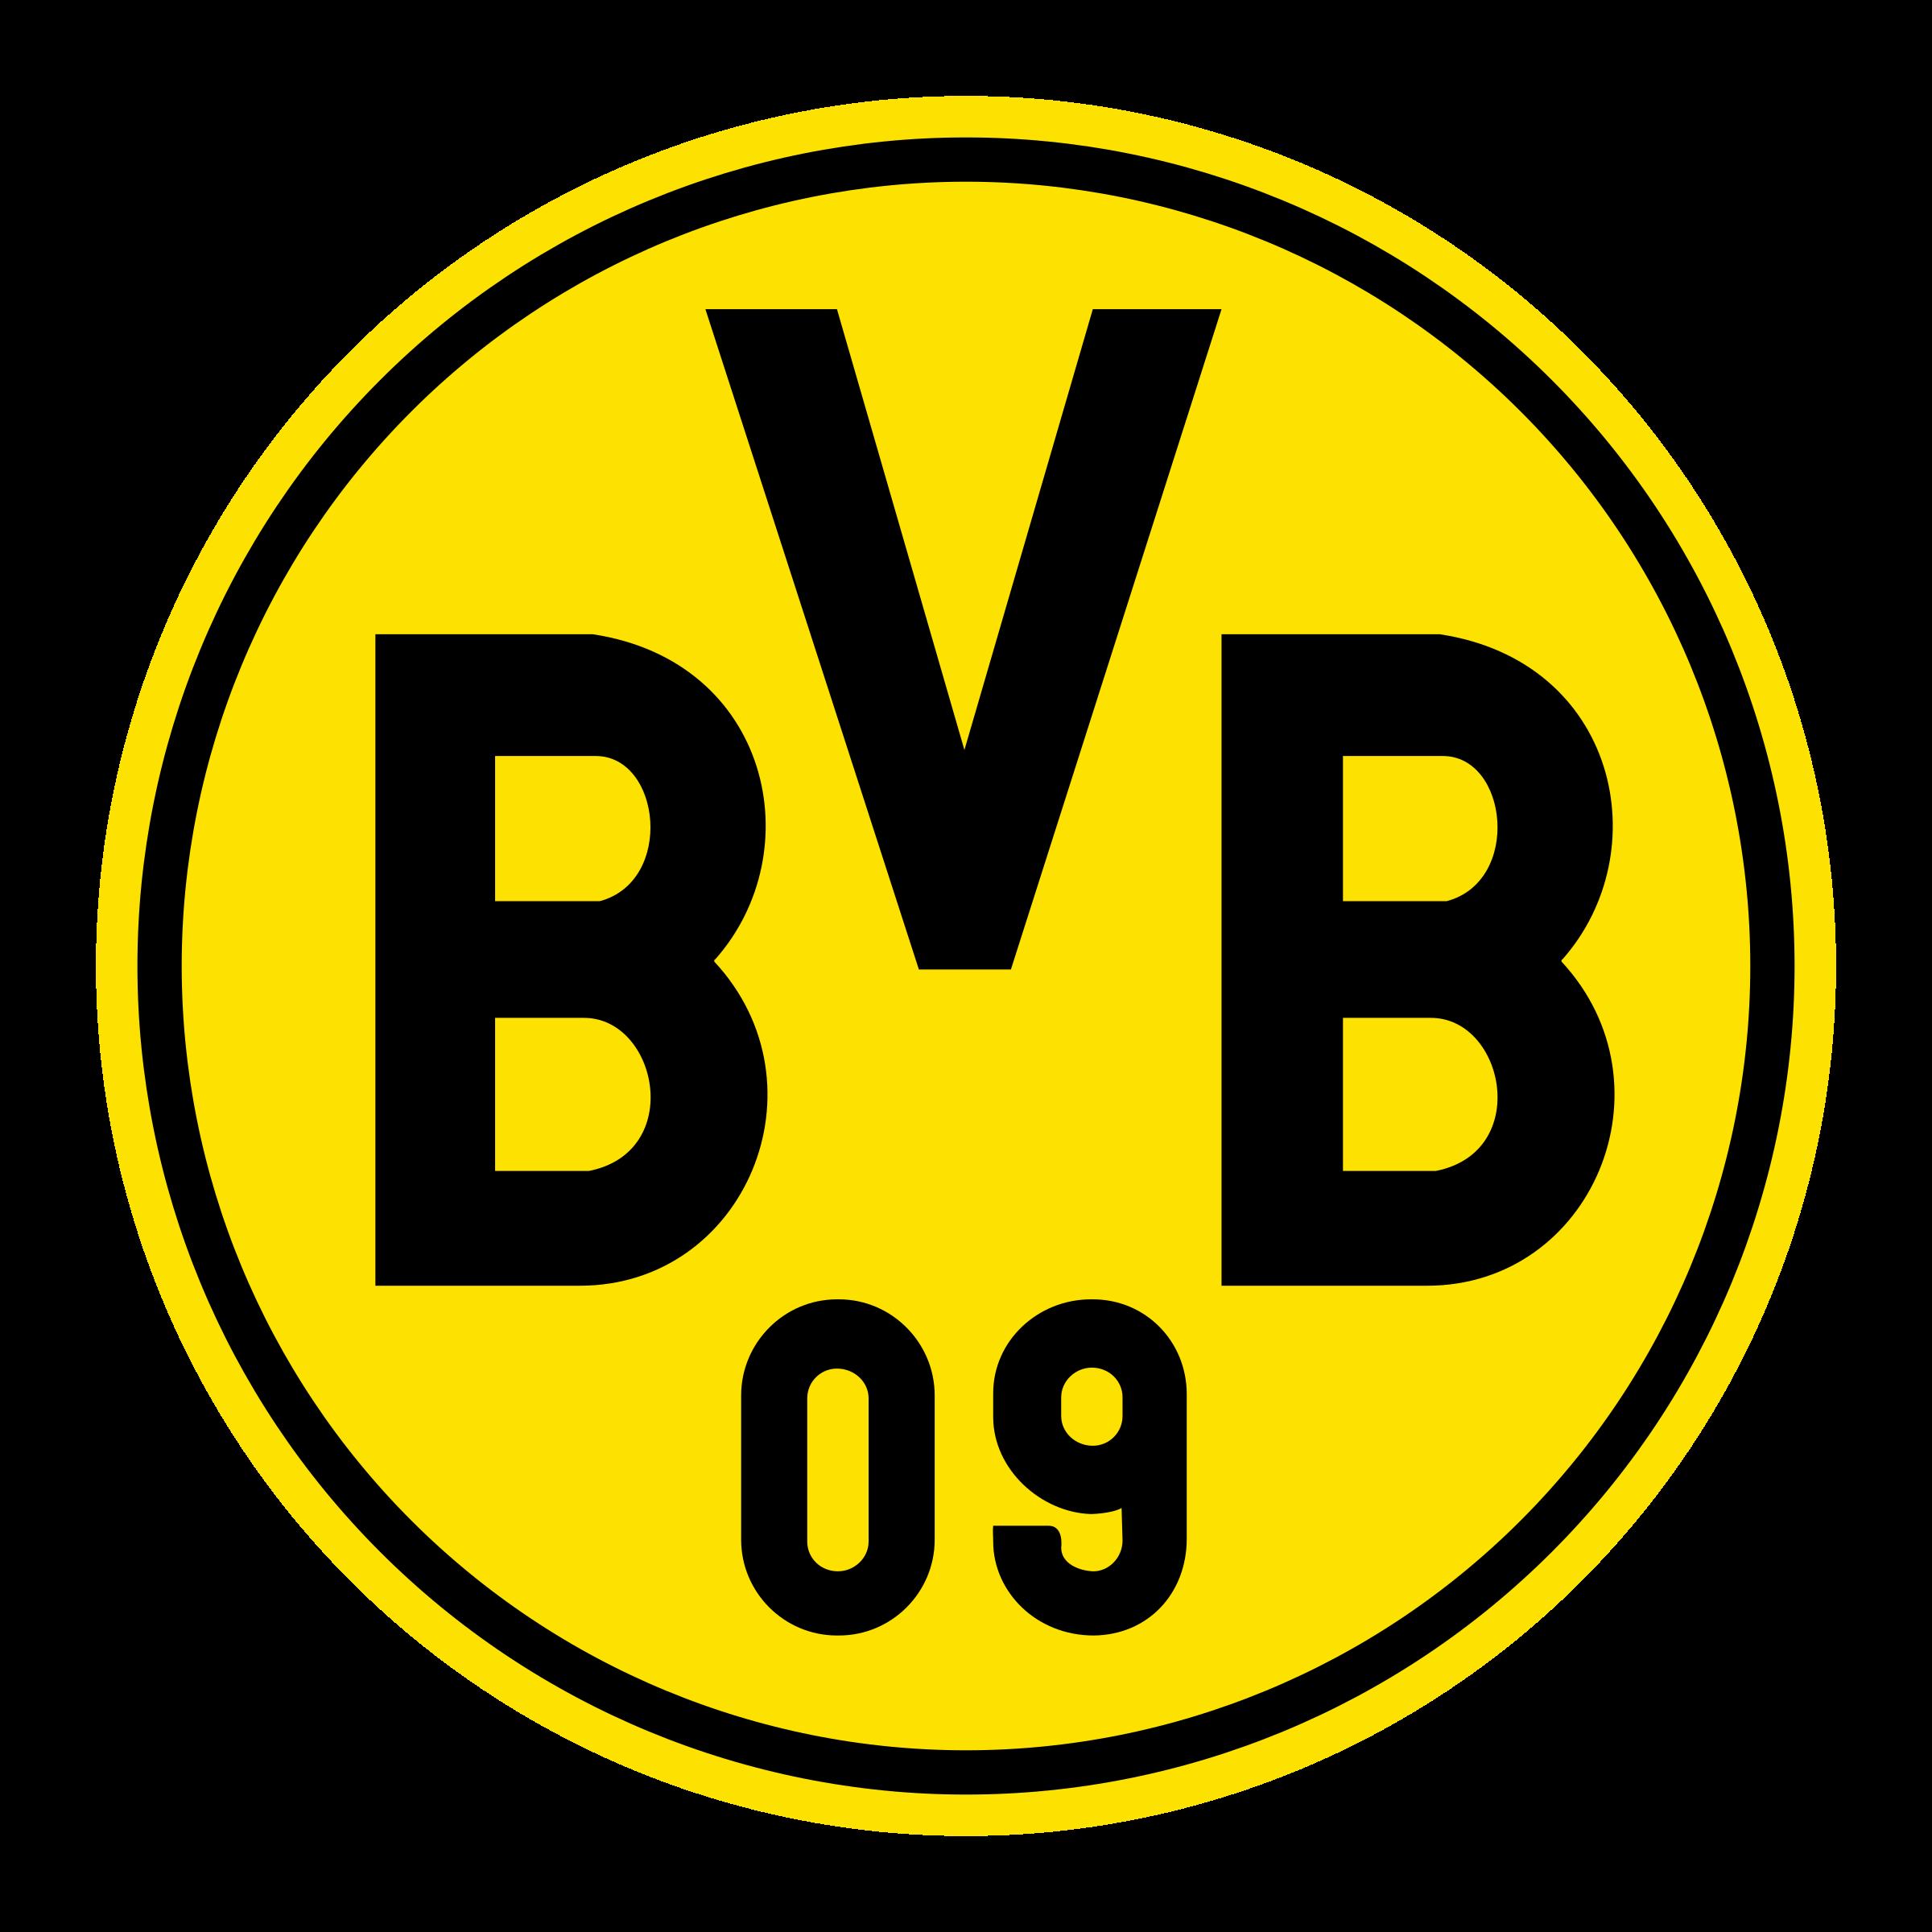 Bvb Logo Png Transparent Svg Vector Freebie Supply